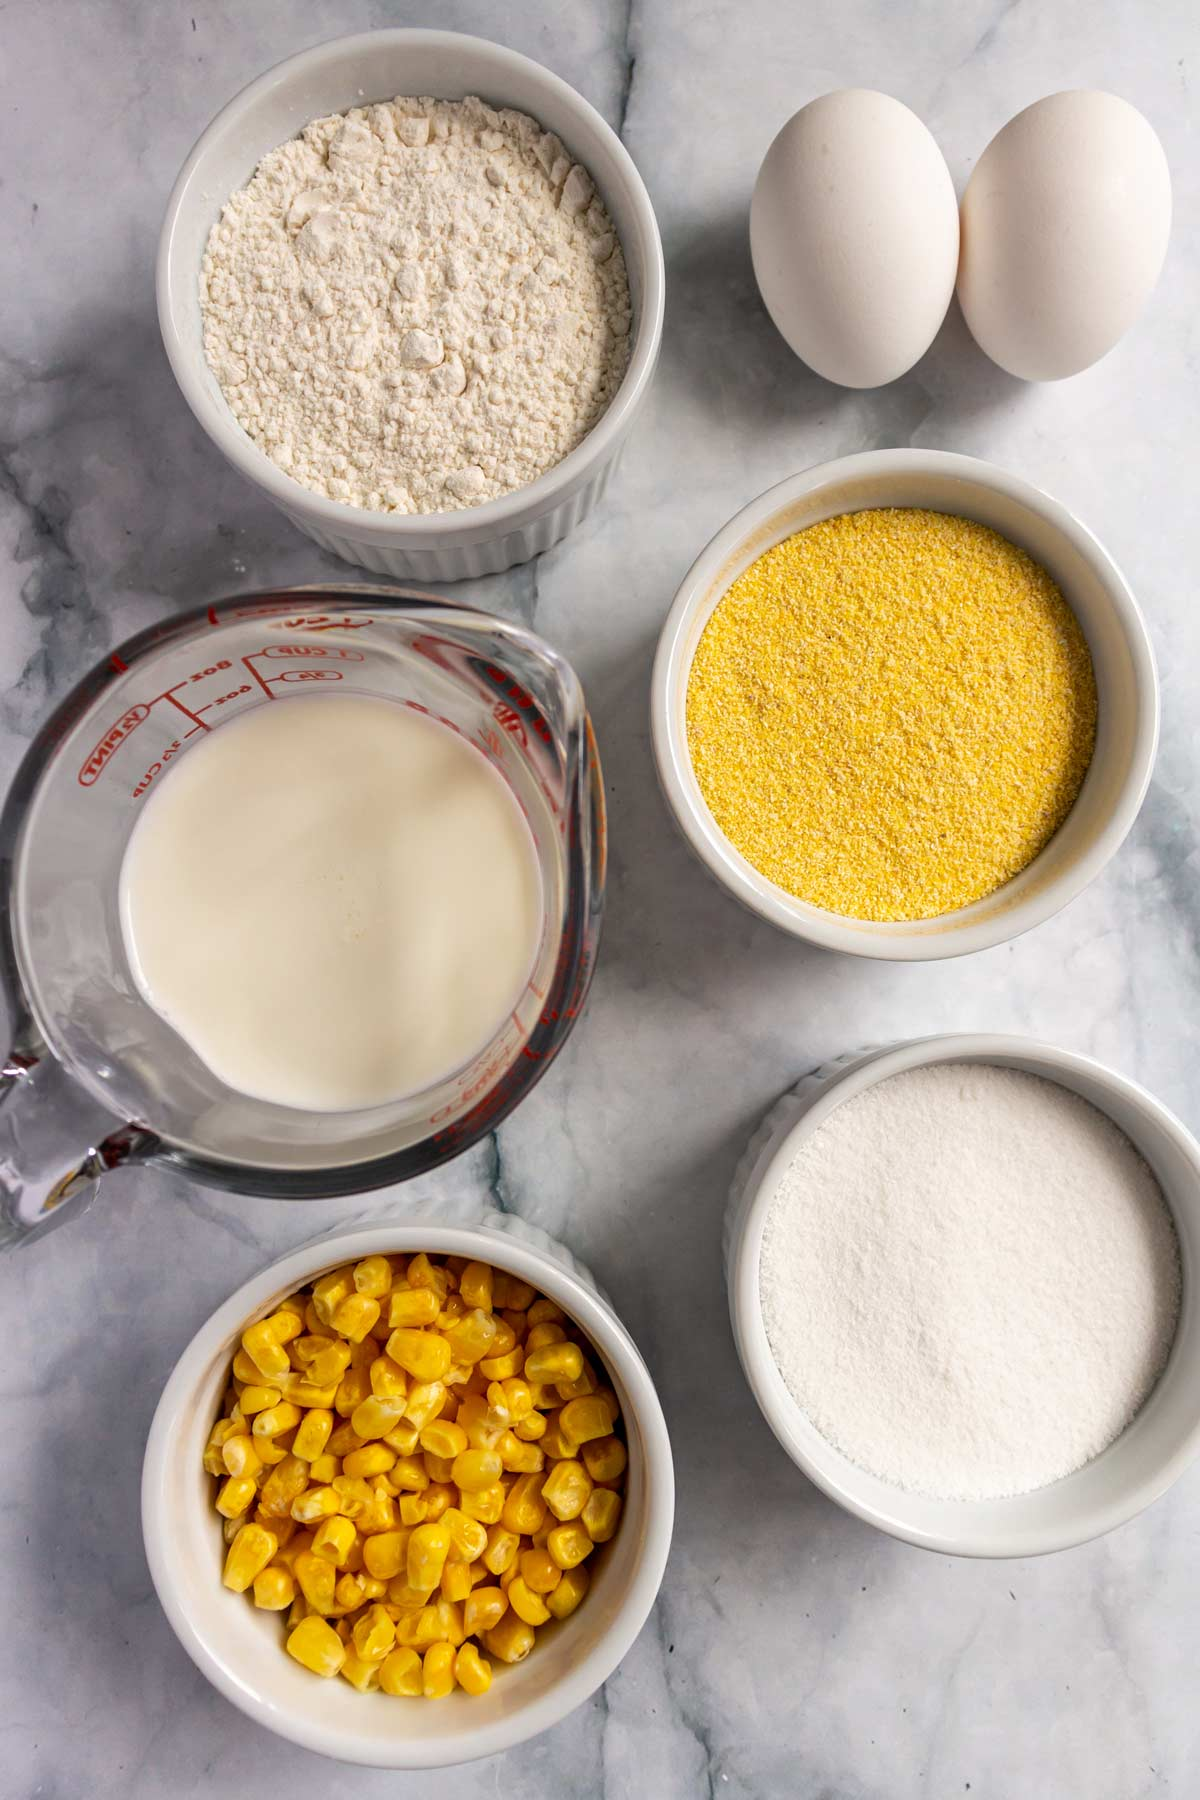 Flour, eggs, milk, cornmeal, sugar, and corn on a marble background.